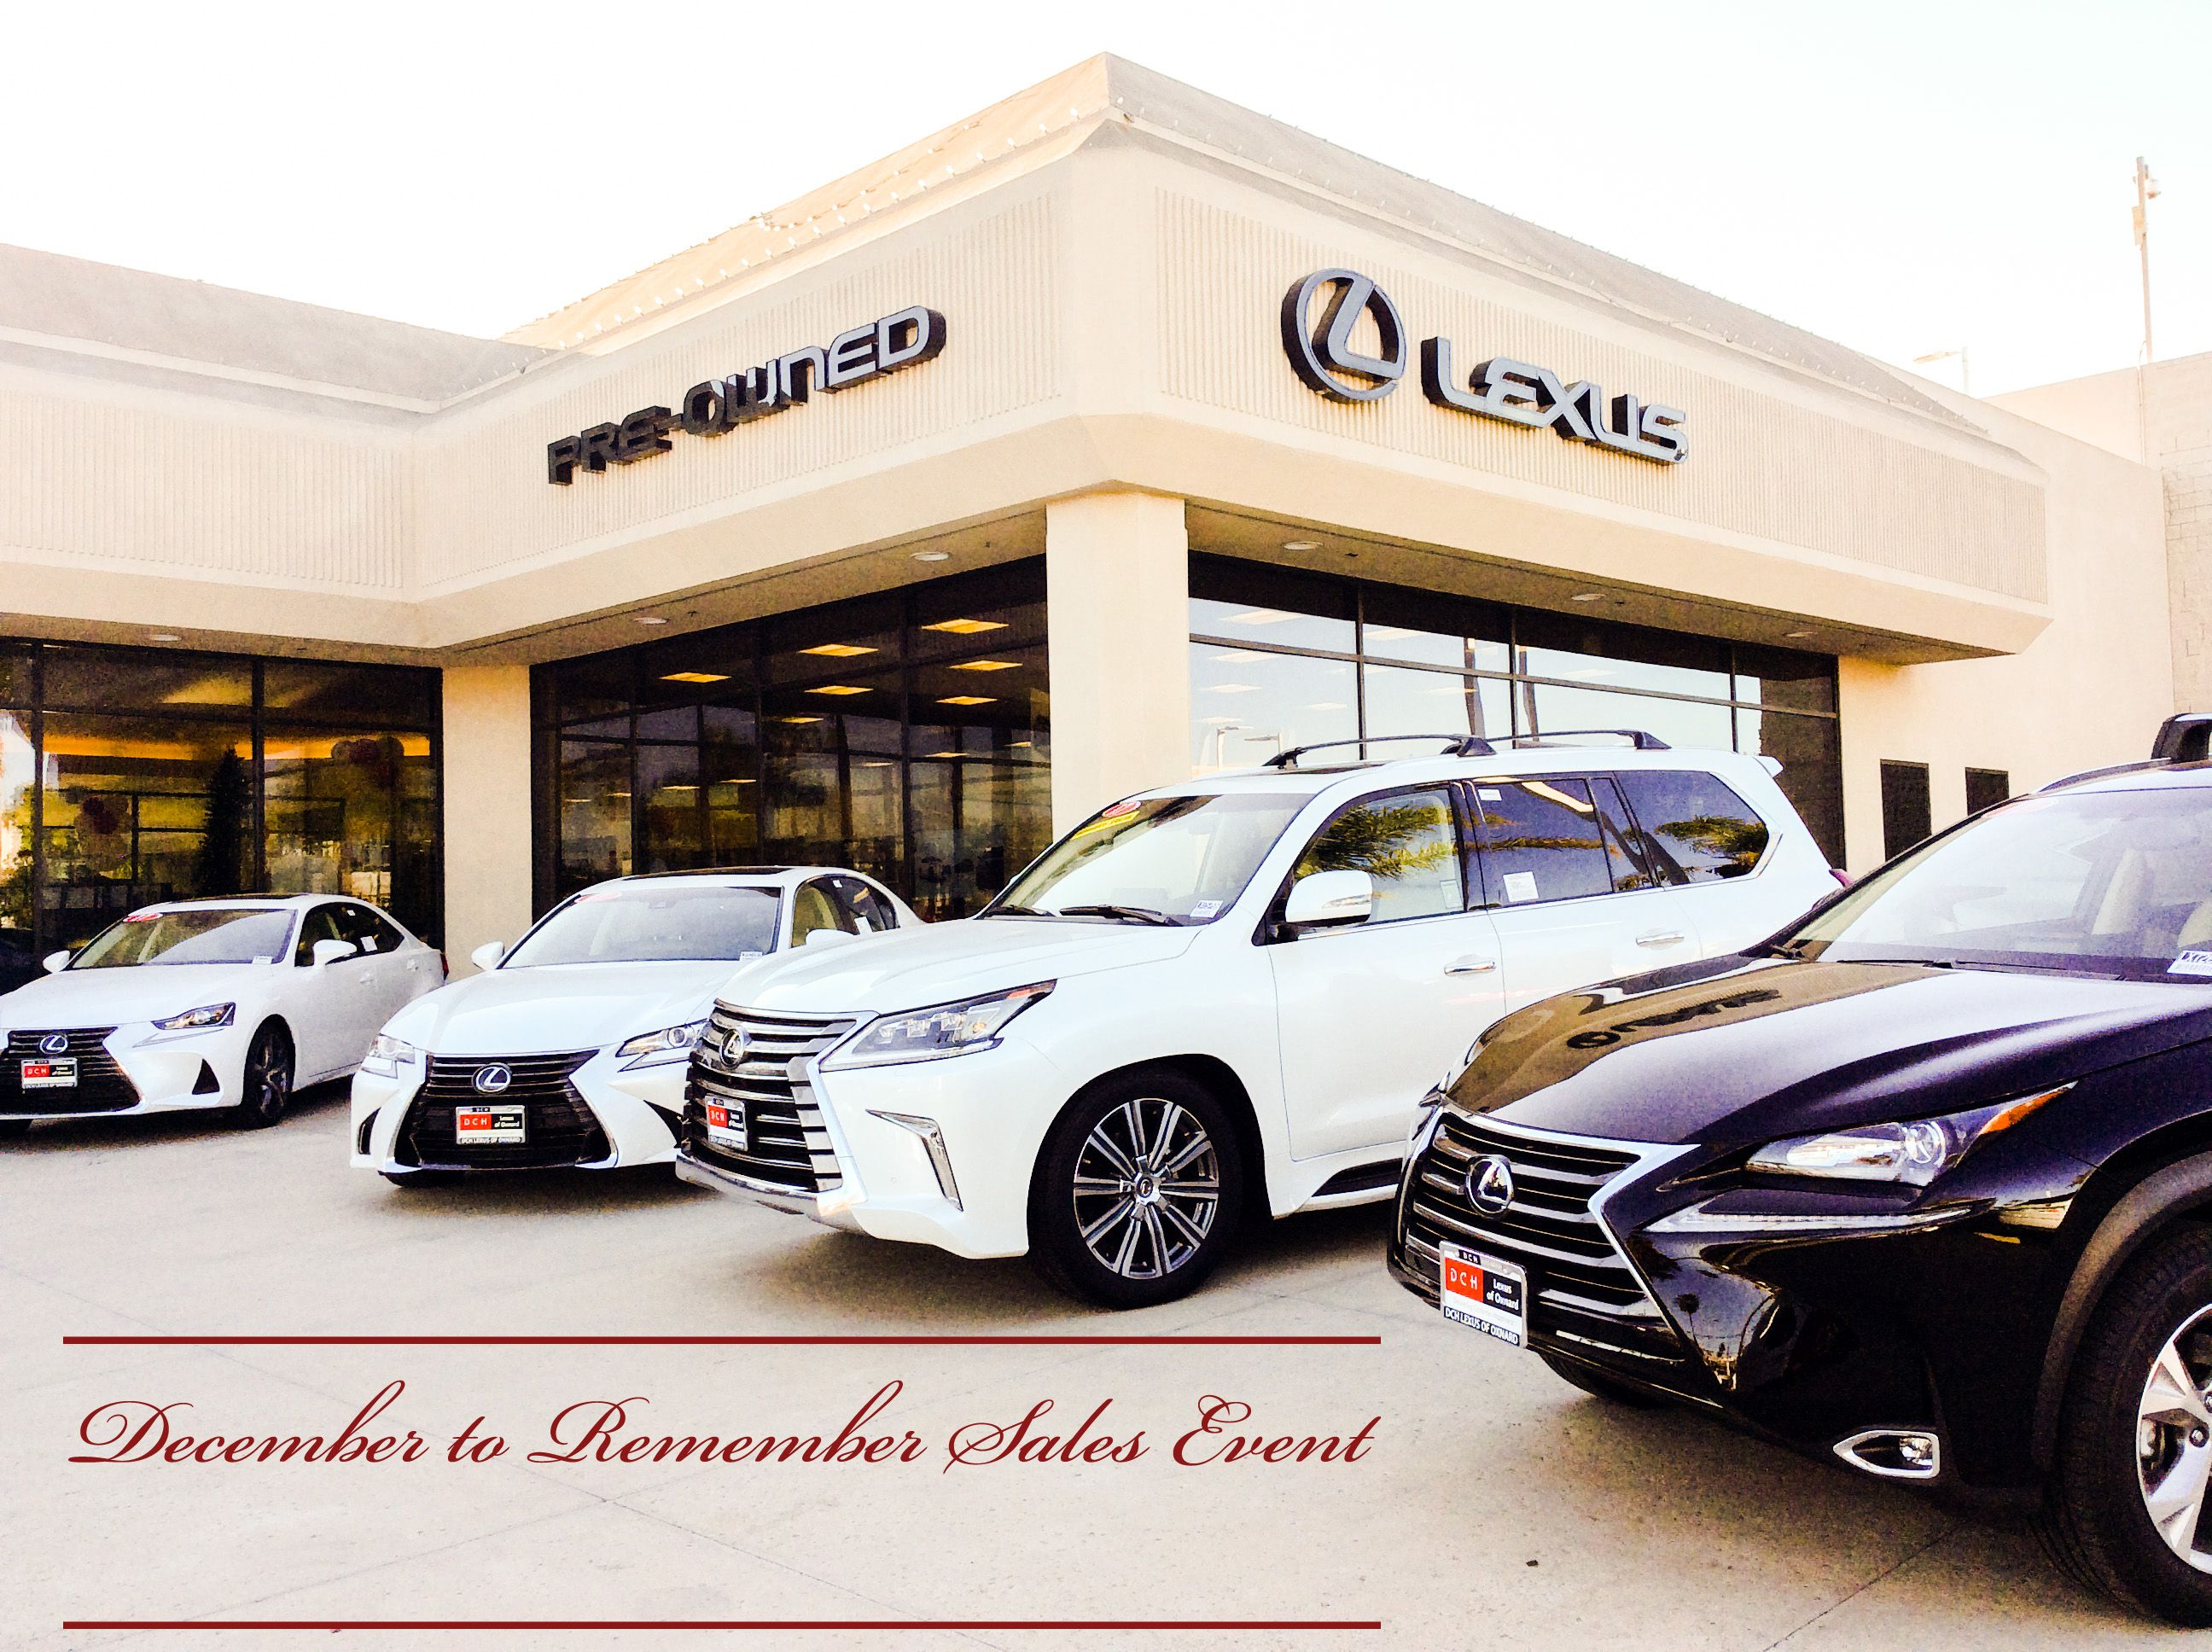 DCH Lexus of Oxnard's #DecembertoRememberSalesEvent will ...